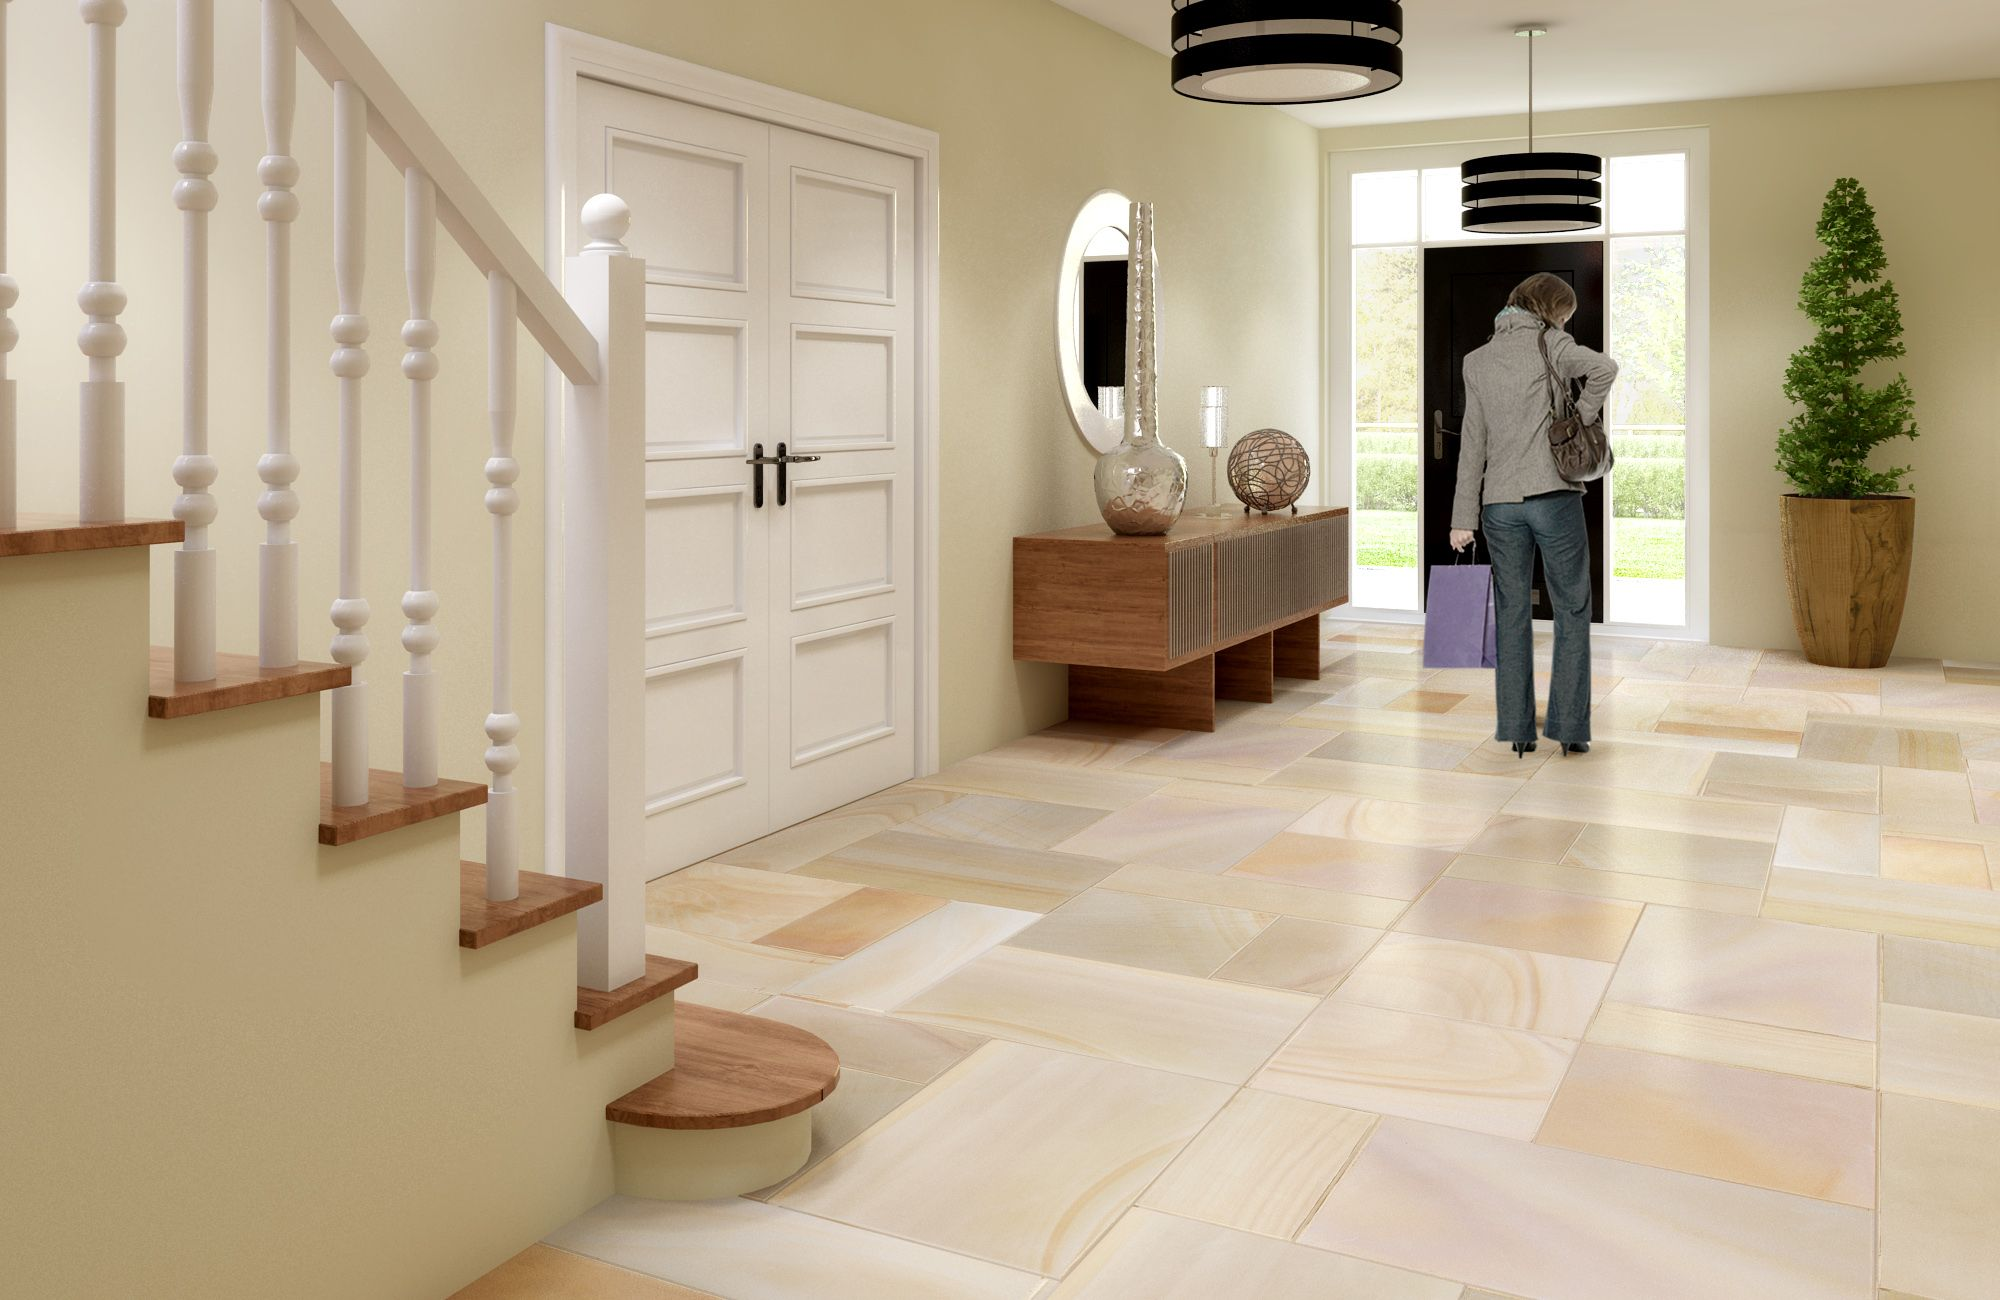 Accessories & Furniture Dazzling Natural Stone Floor Tile